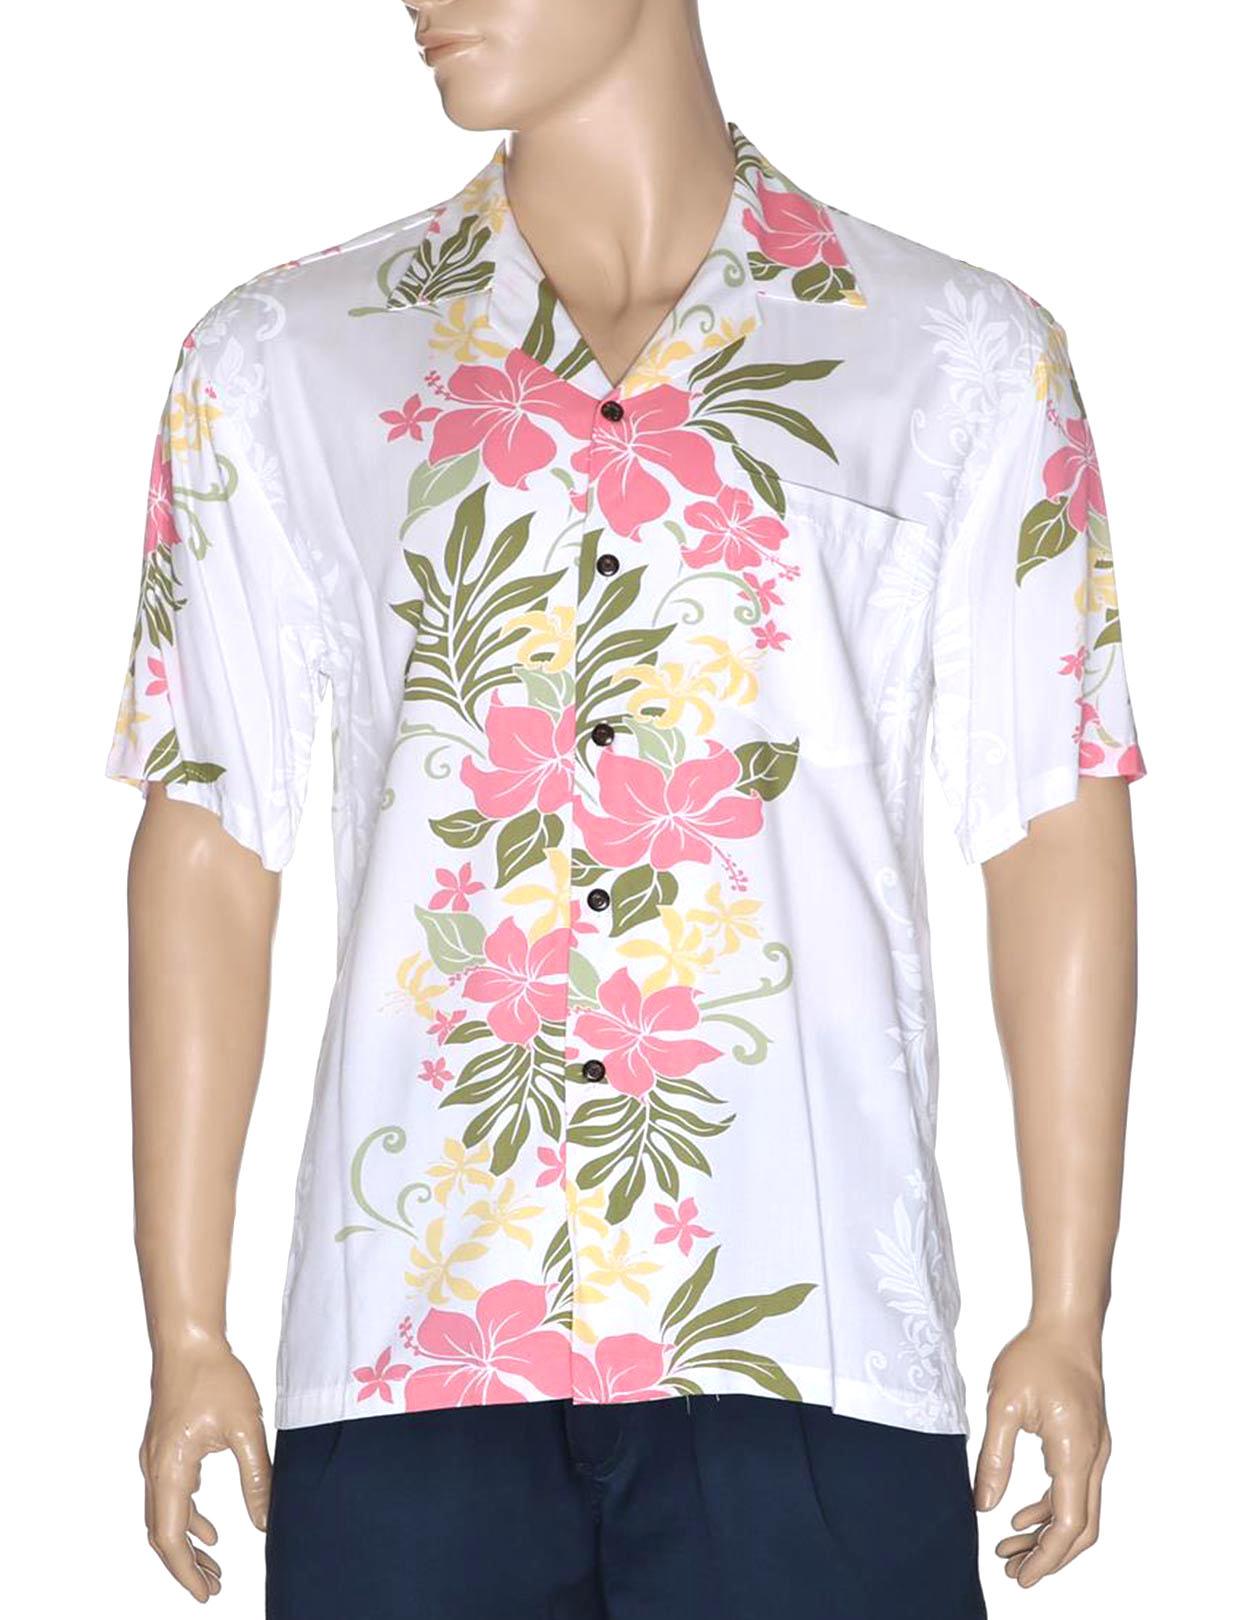 2245ac62355 Lokelani Rayon Aloha Shirt White  Shaka Time Hawaii Clothing Store